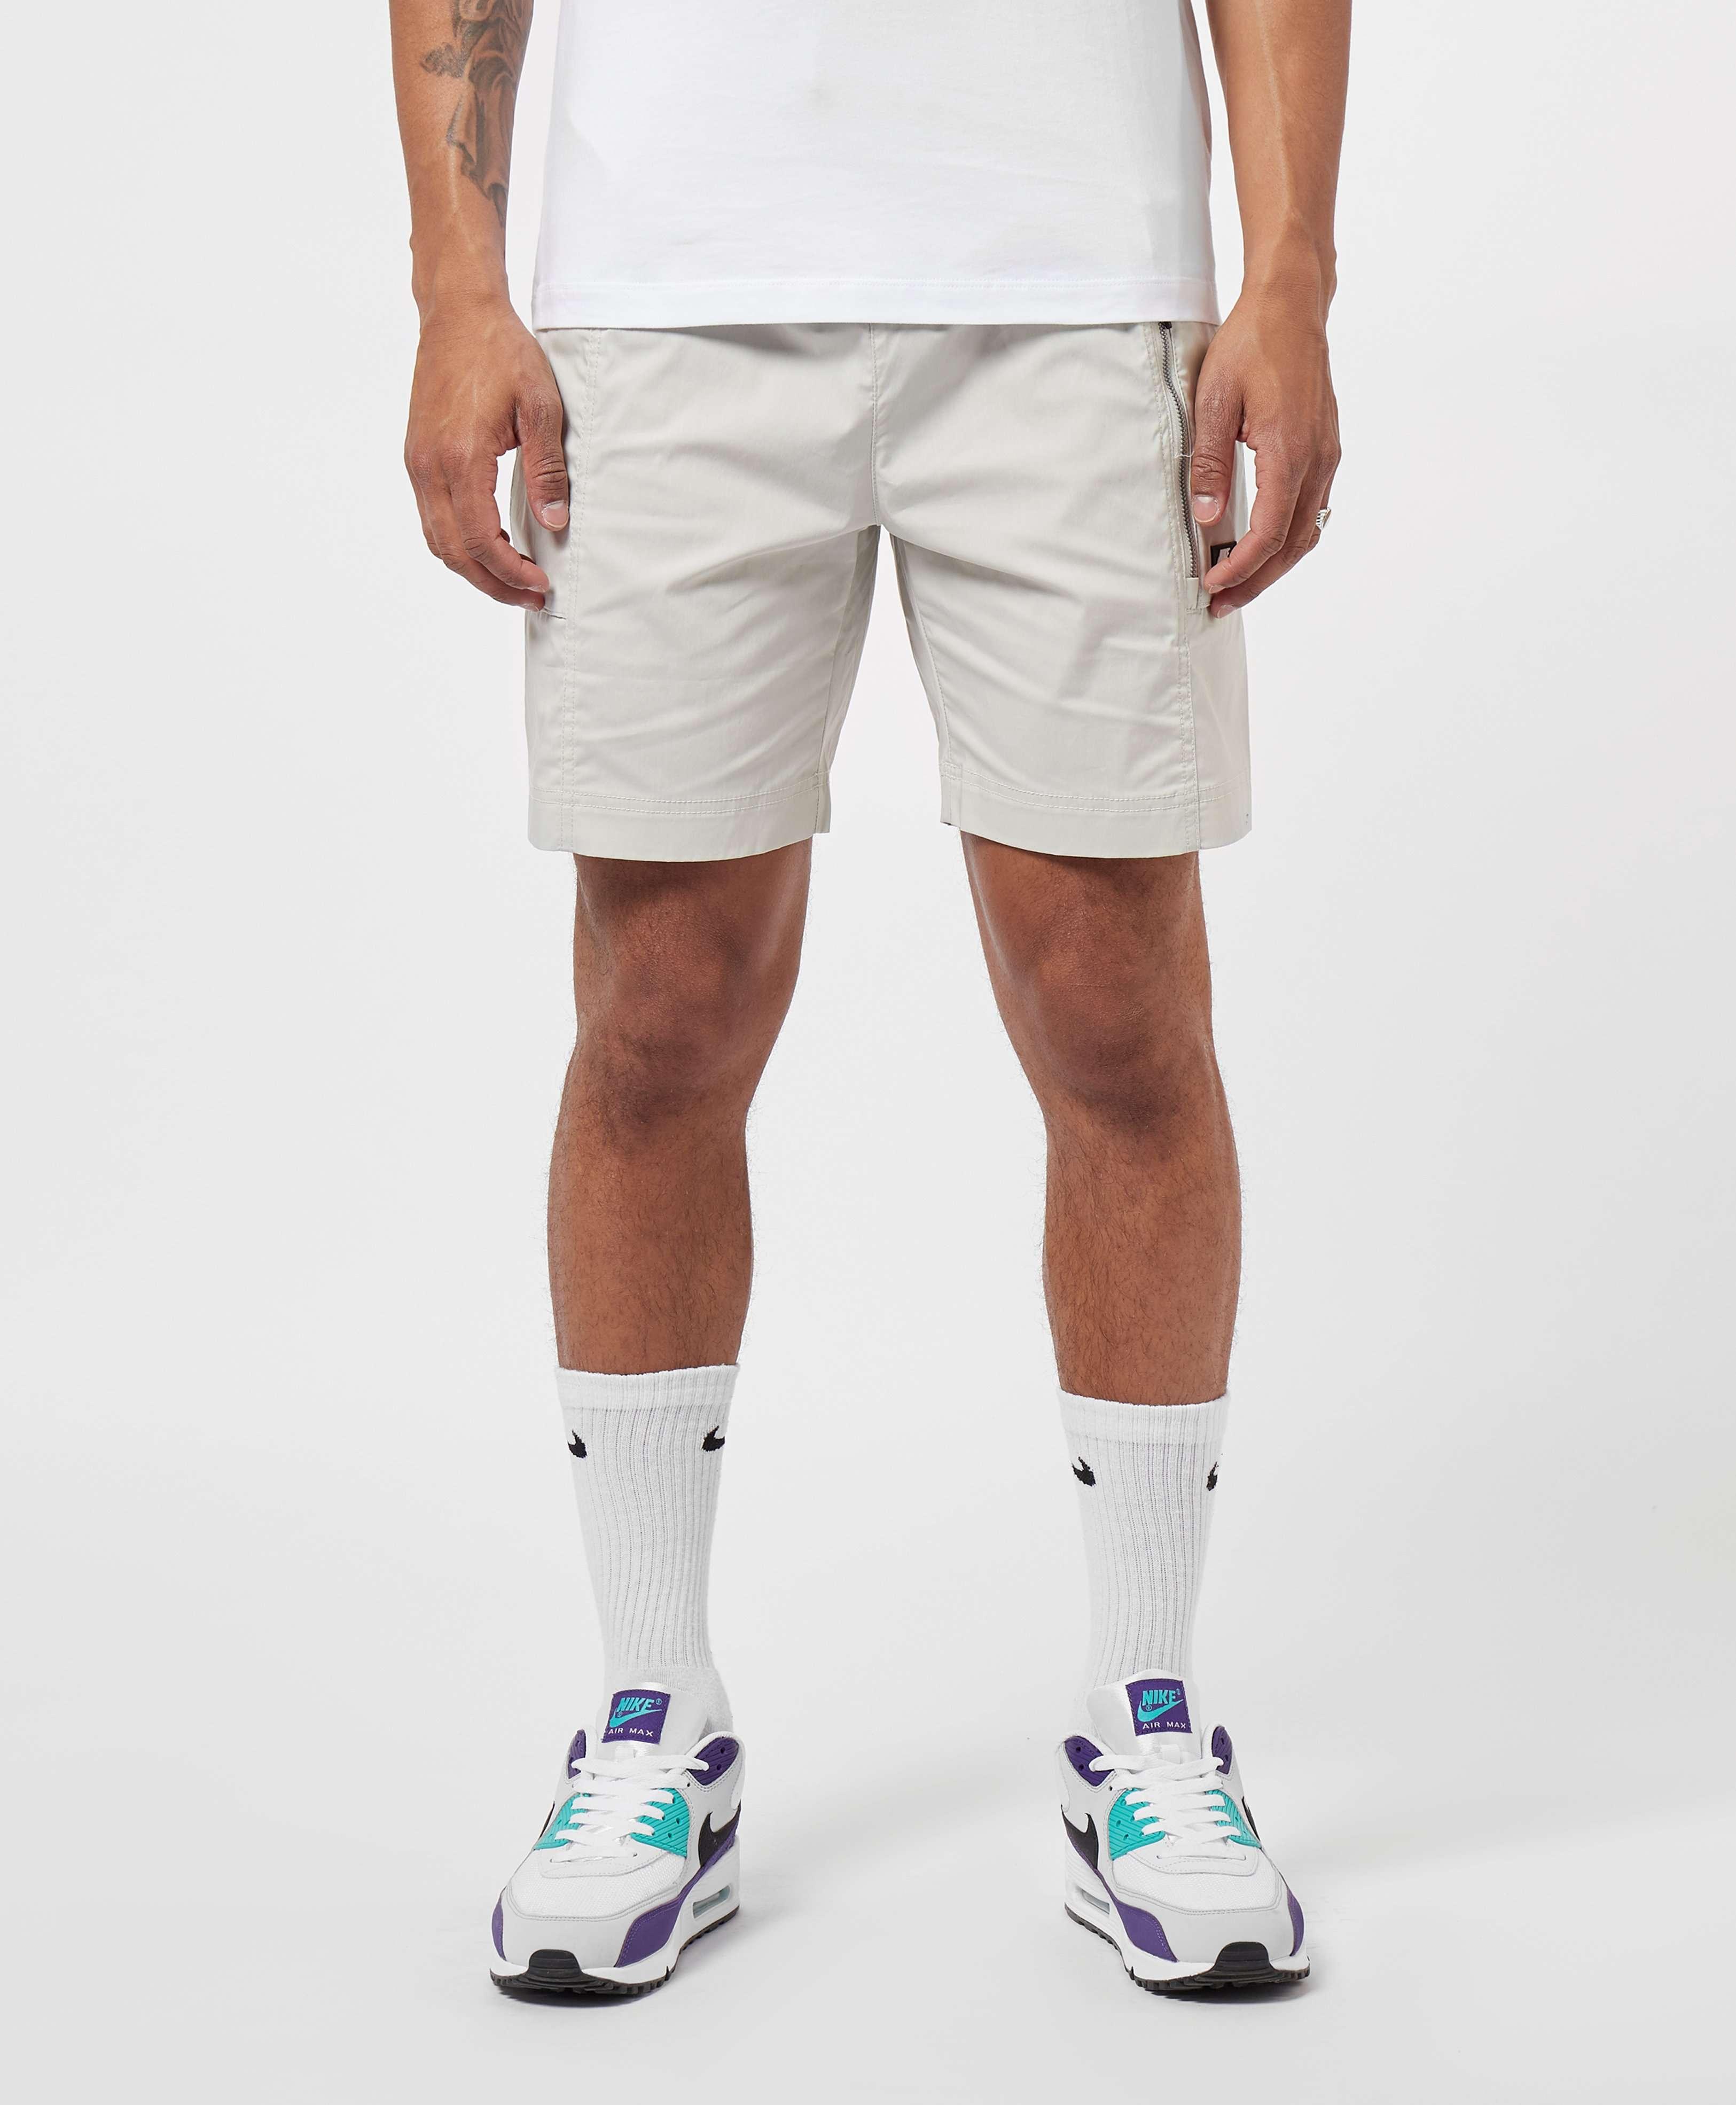 Nike Woven Cargo Shorts